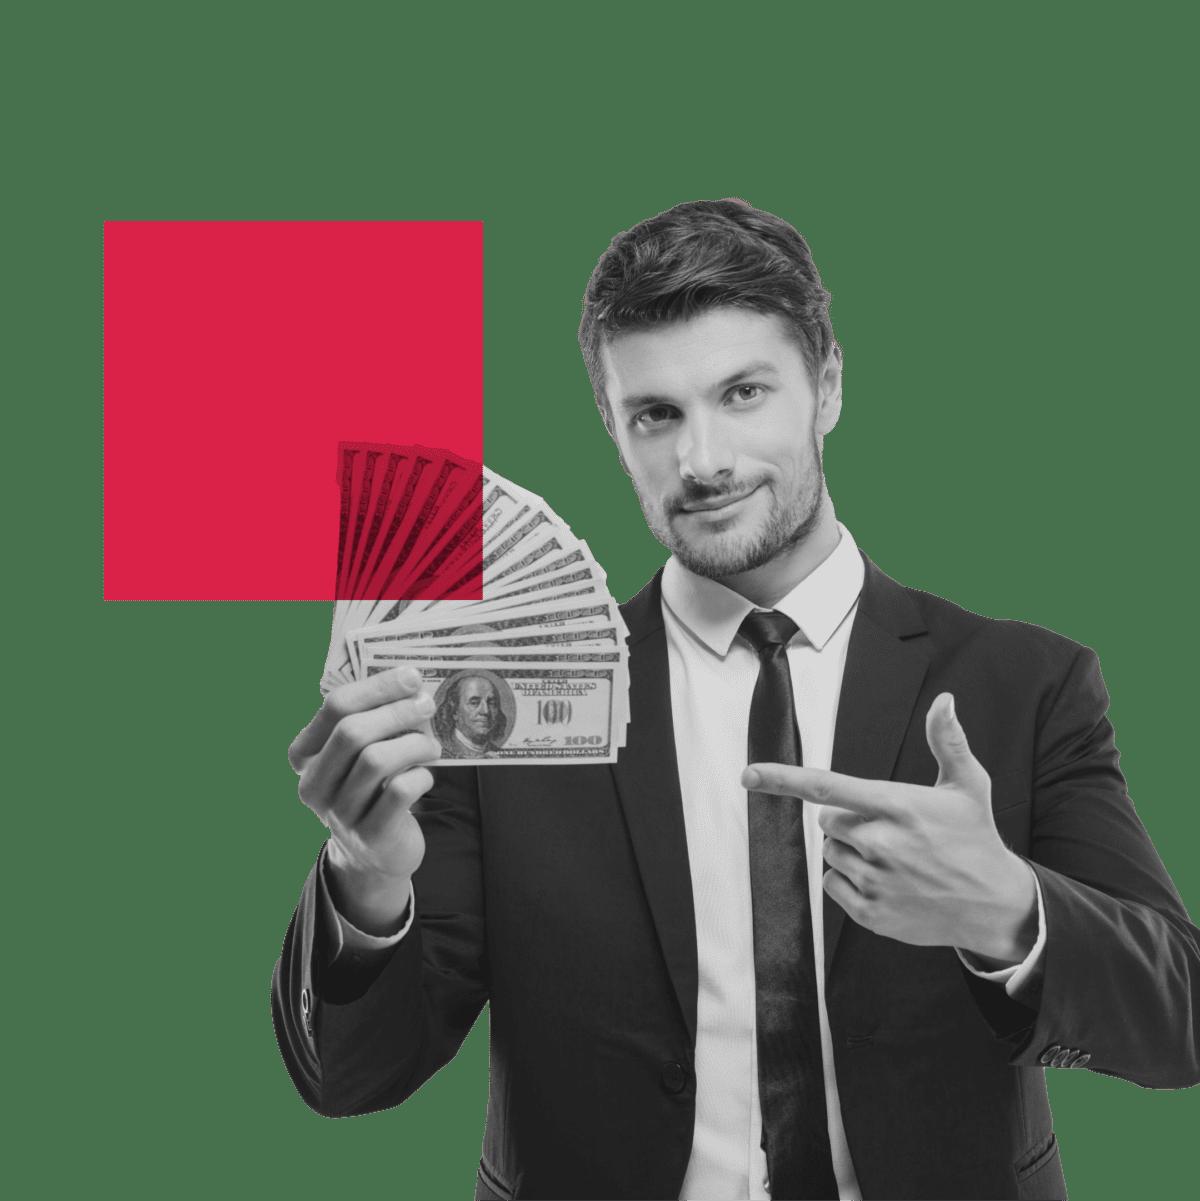 should sales reps handle overdue account receivables?